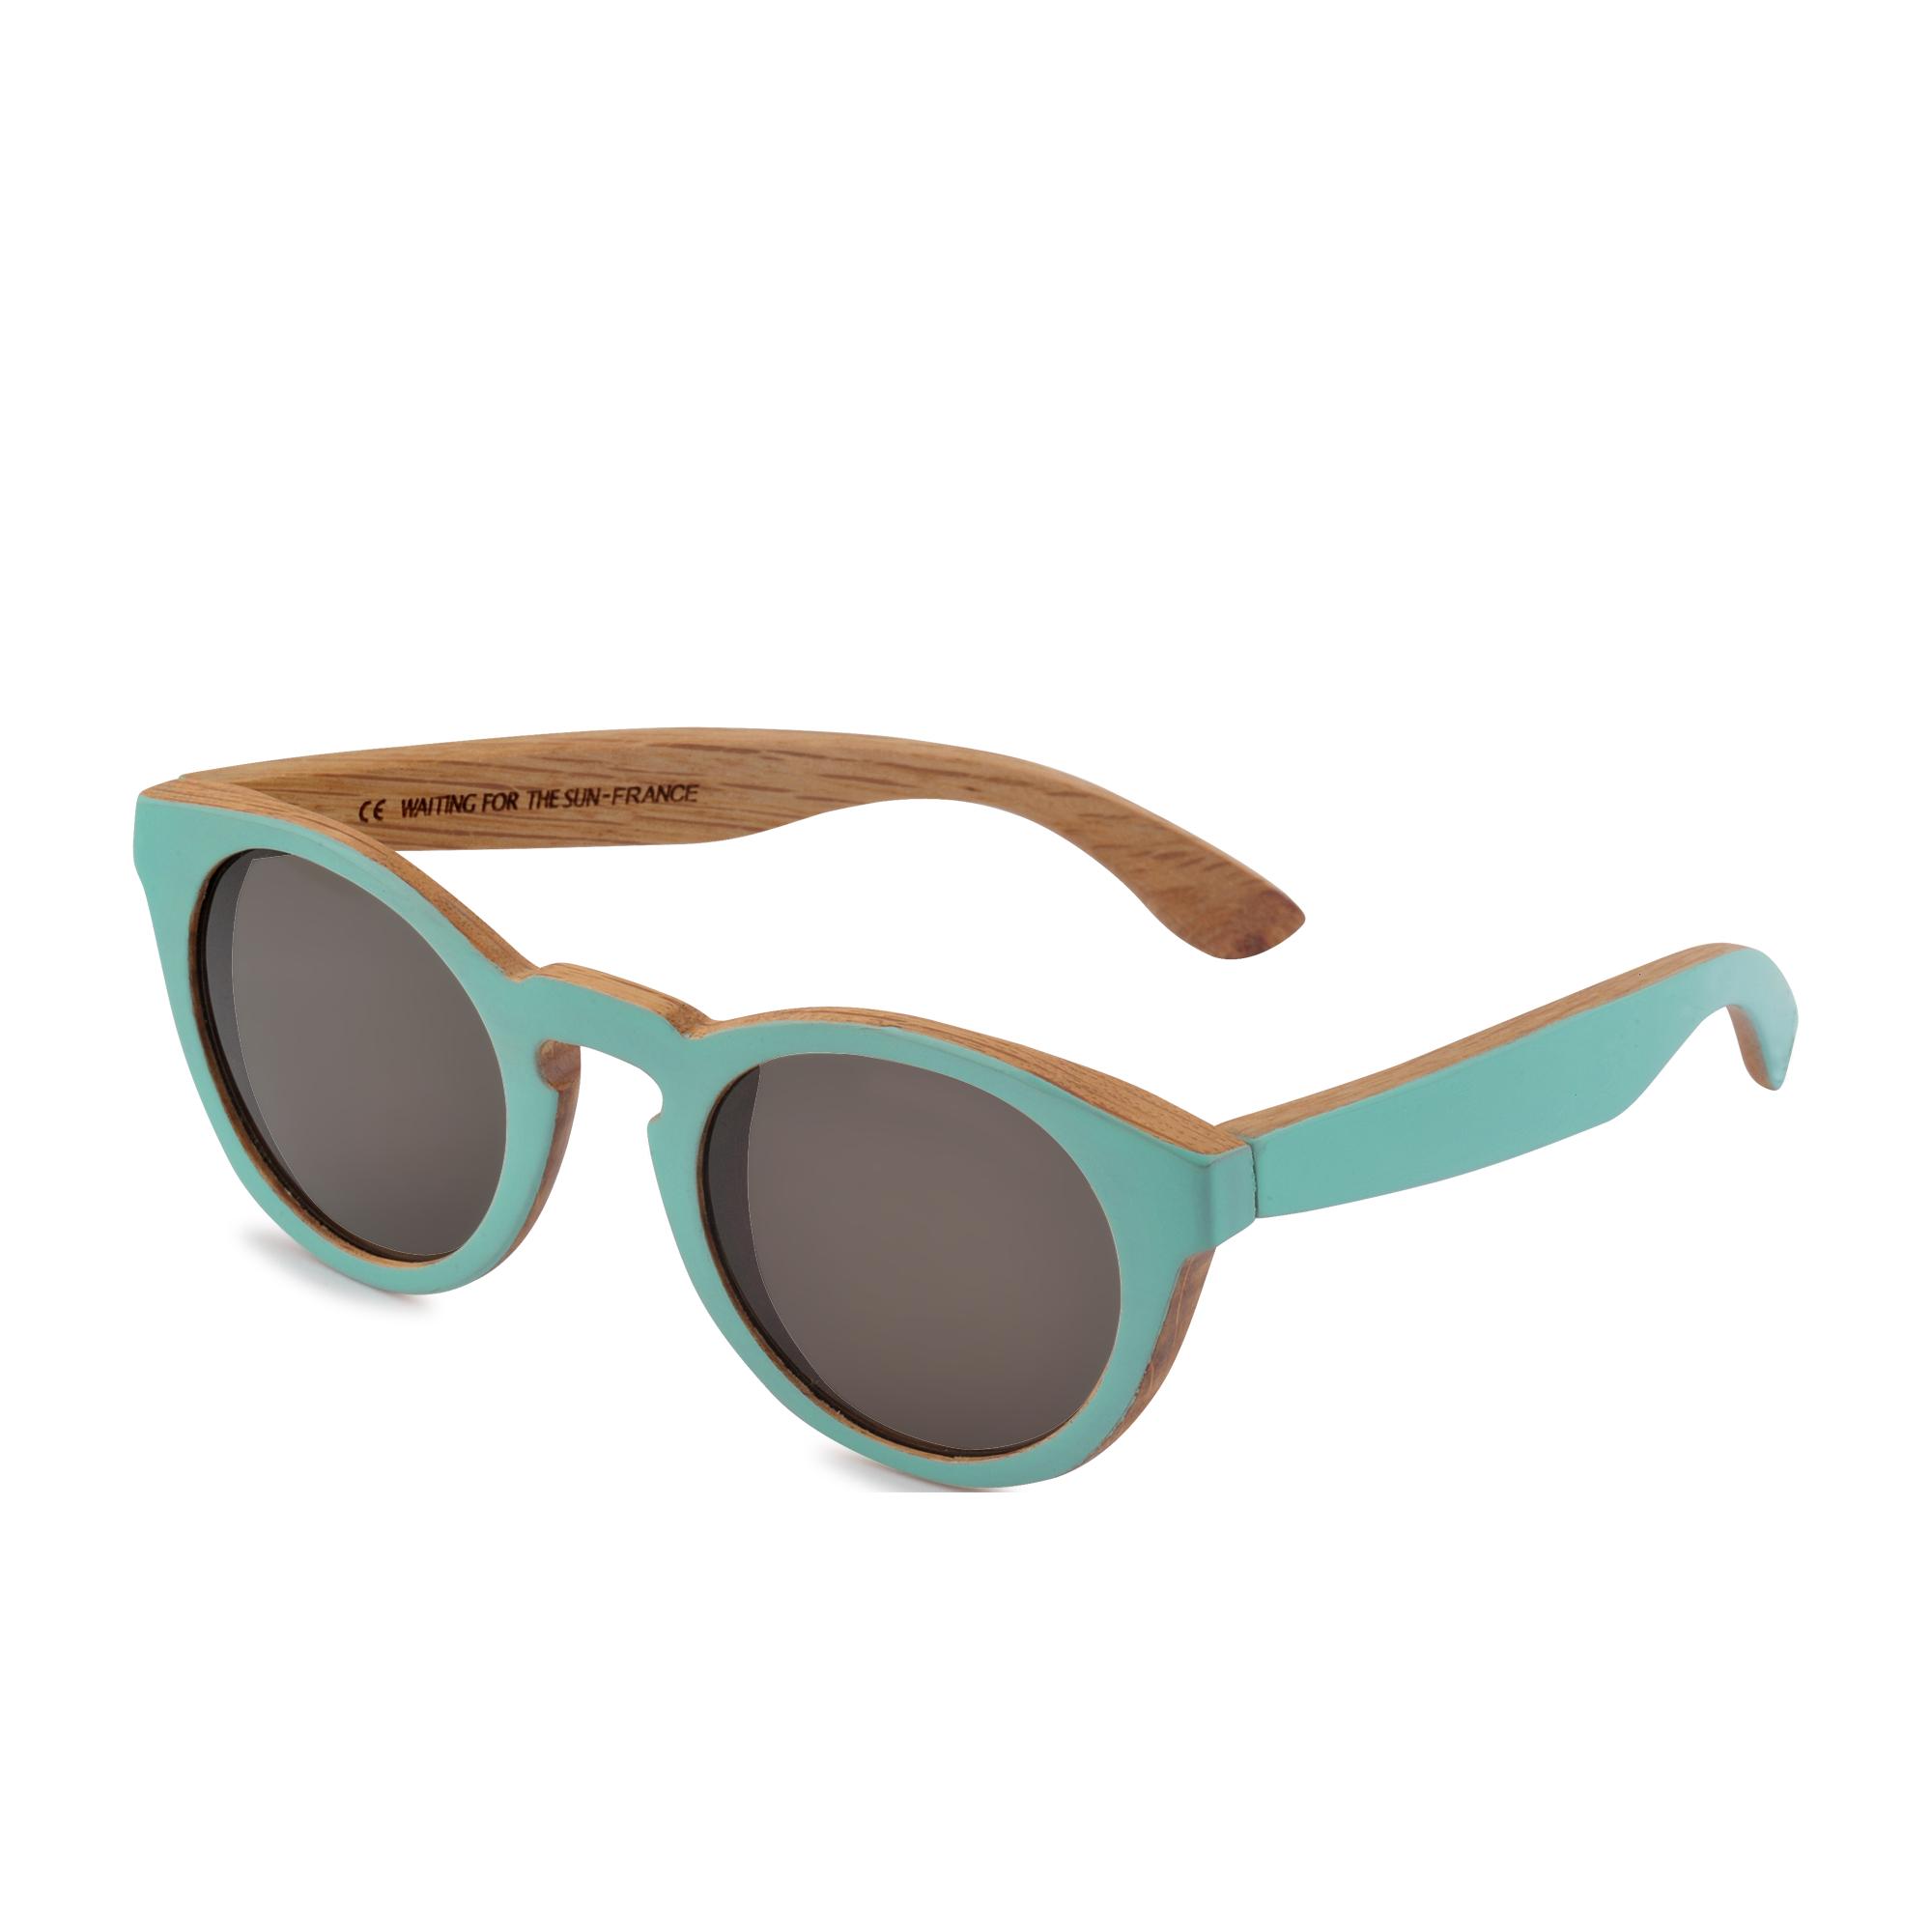 Waiting for the sun Summer Love / Oakwood Sunglasses in ...